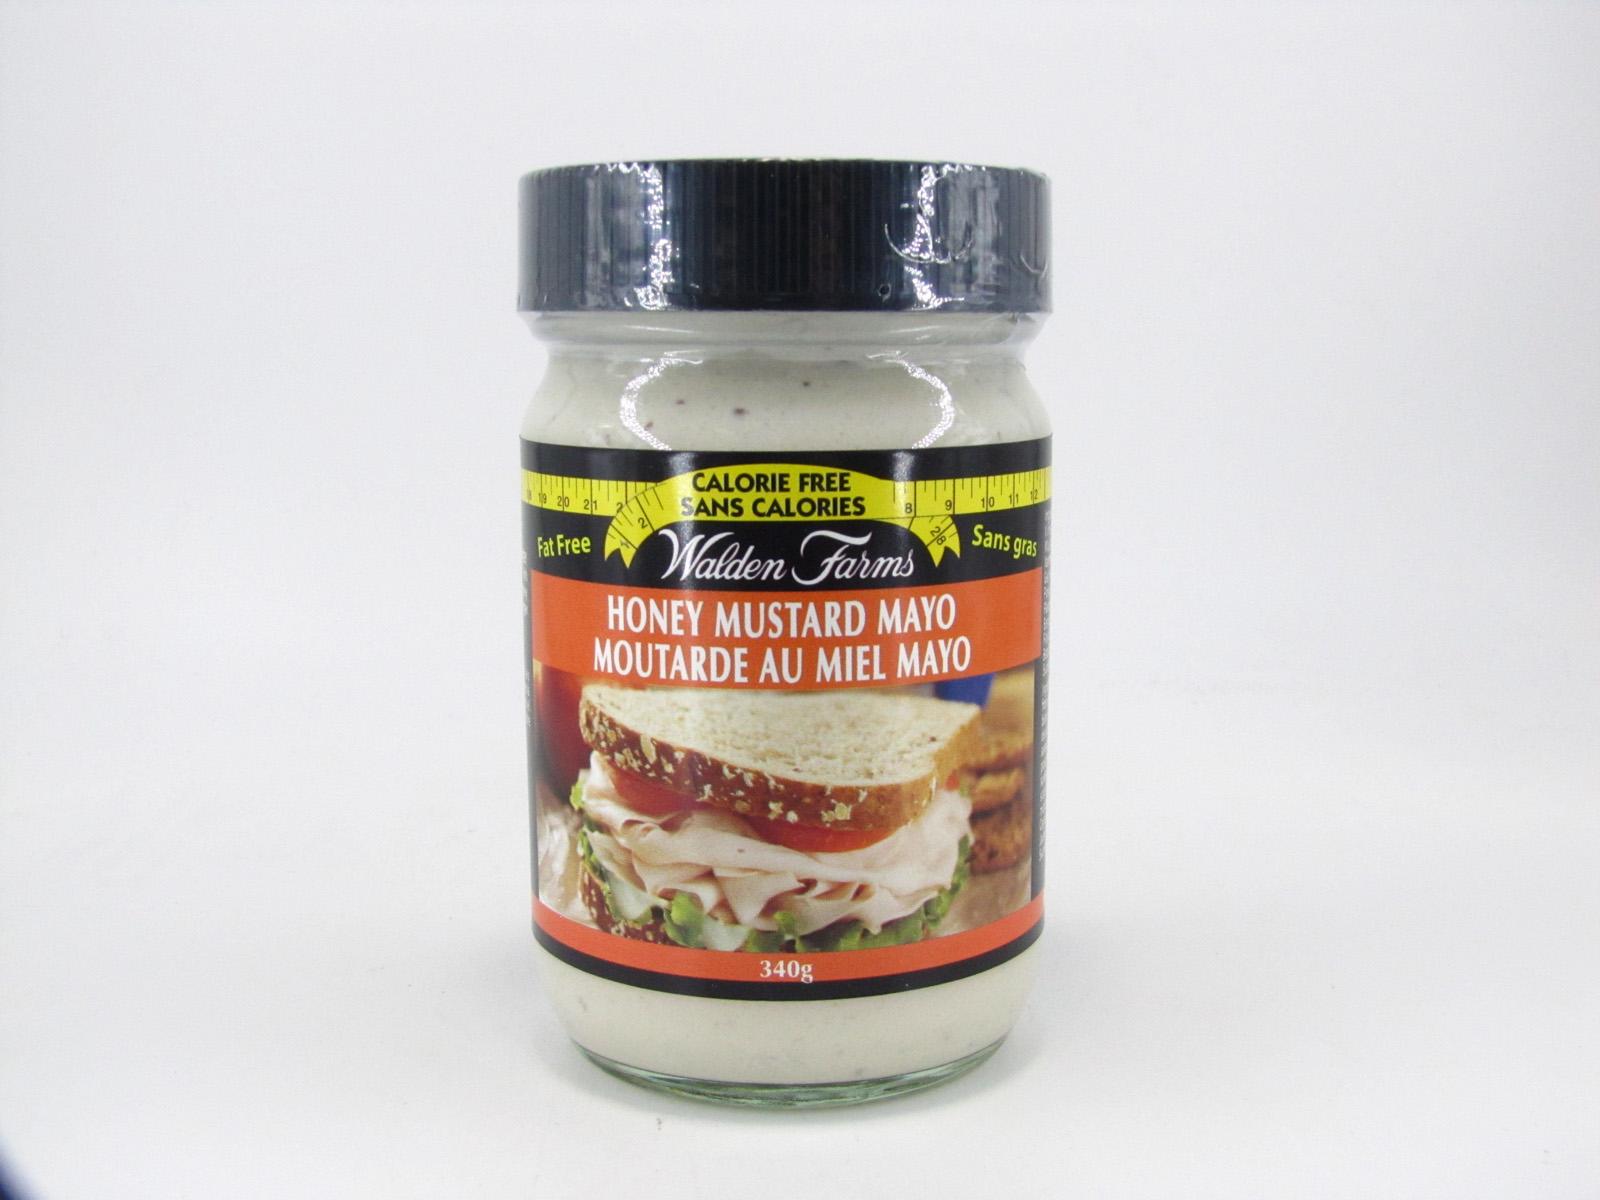 Waldenfarms Mayo - Honey Mustard - front view